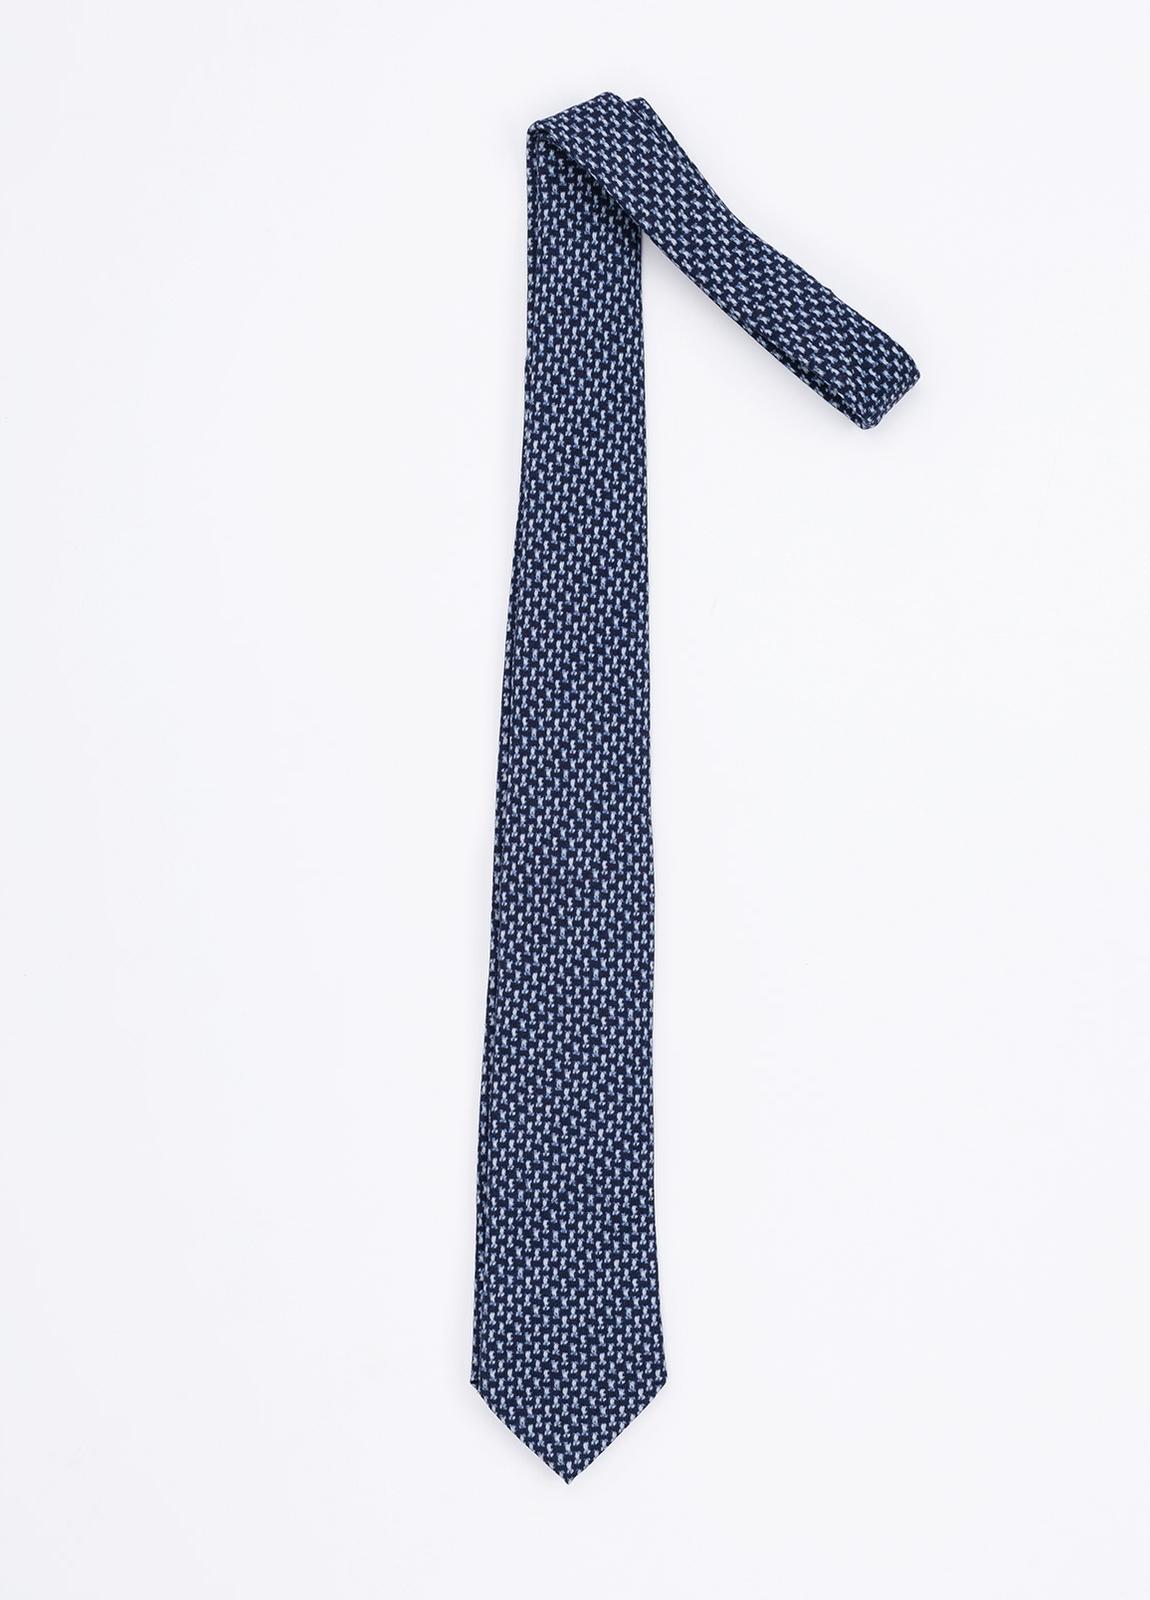 Corbata Formal Wear microdibujo, color azul. Pala 7,5 cm. 100% Lana. - Ítem1